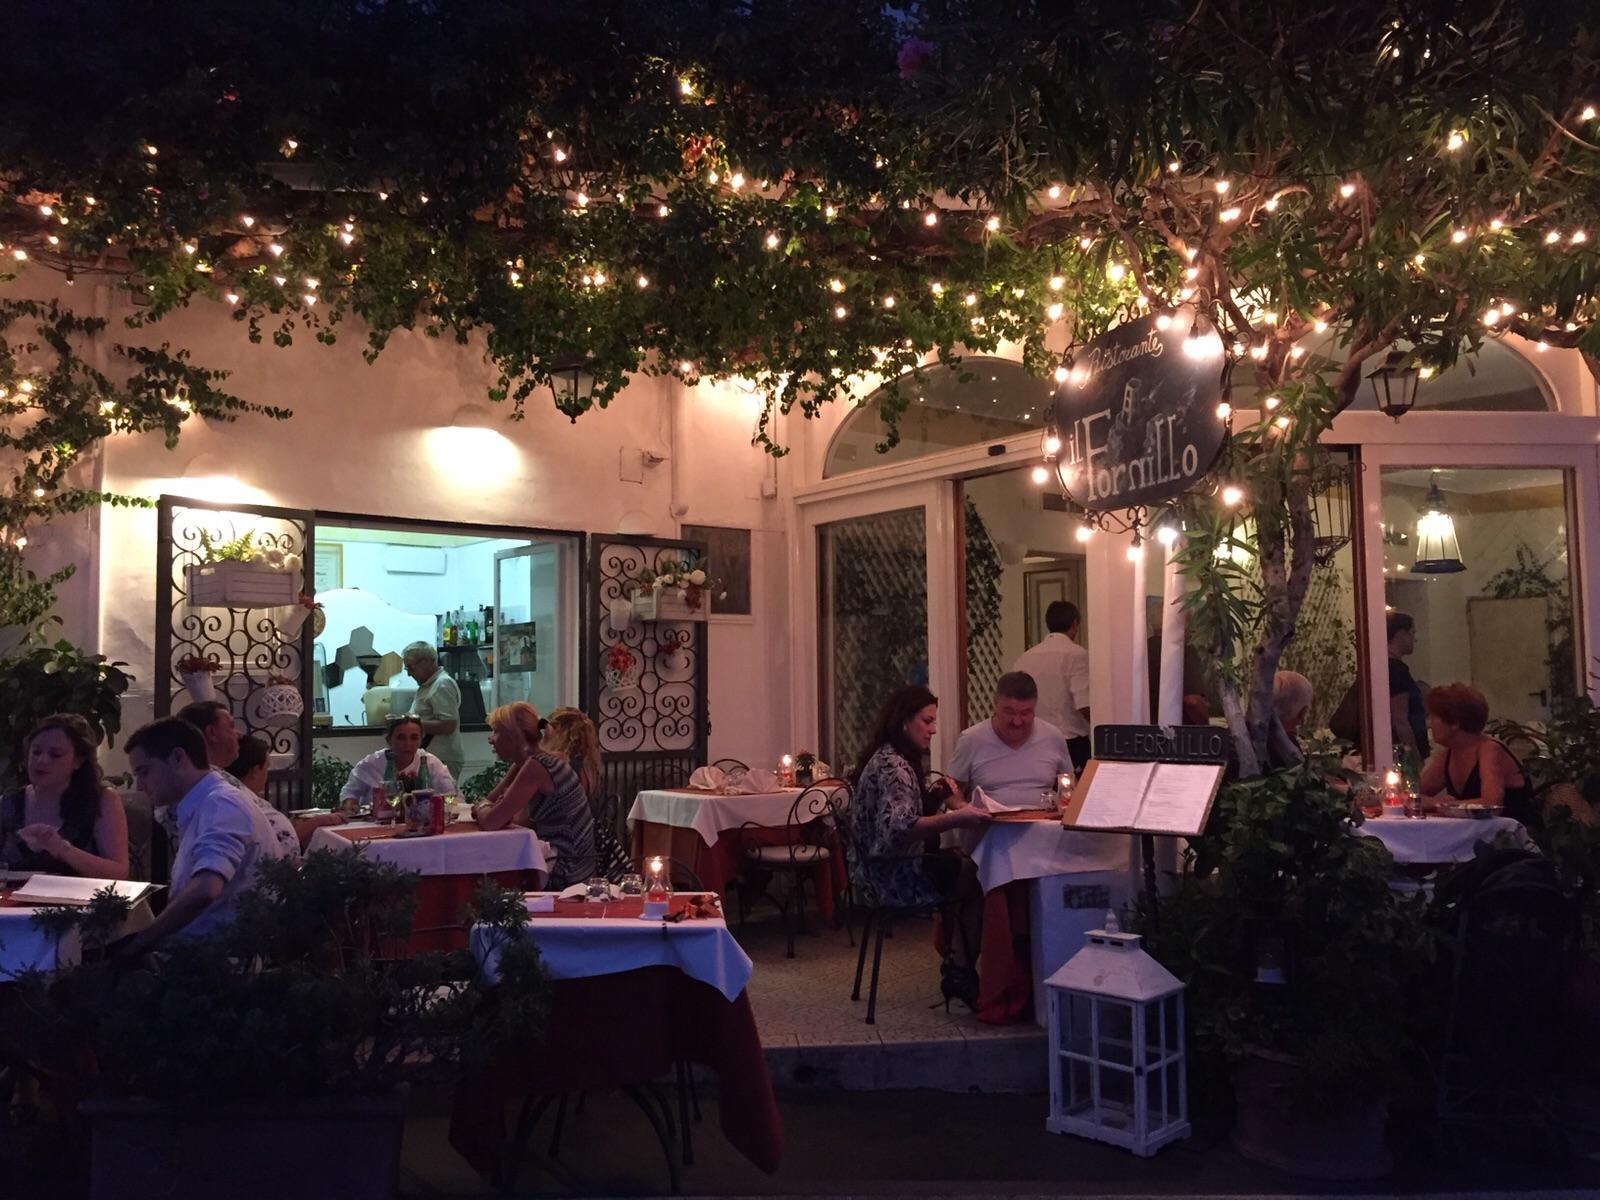 Vegan food at pizza restaurant/takeaway Il Fornillo, Positano, Italy